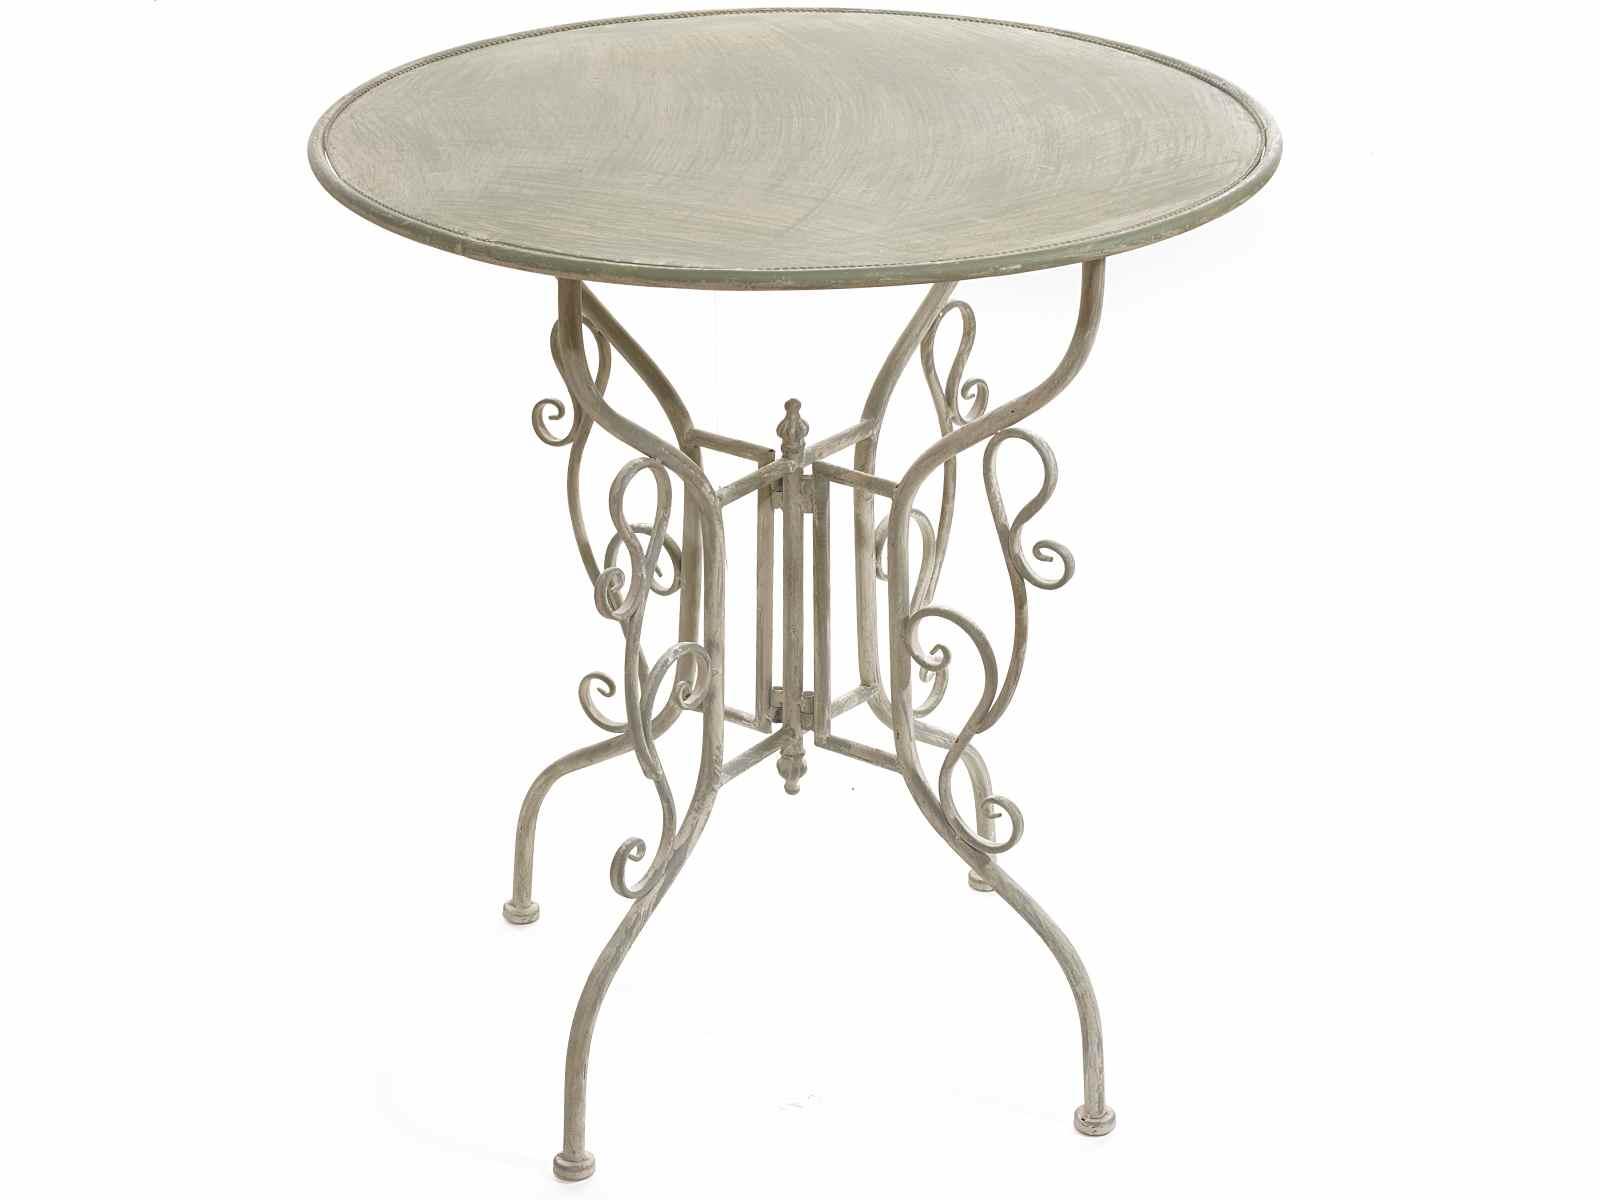 Table de jardin en métal avec garnitures vertes (53.20.55) - Art ...